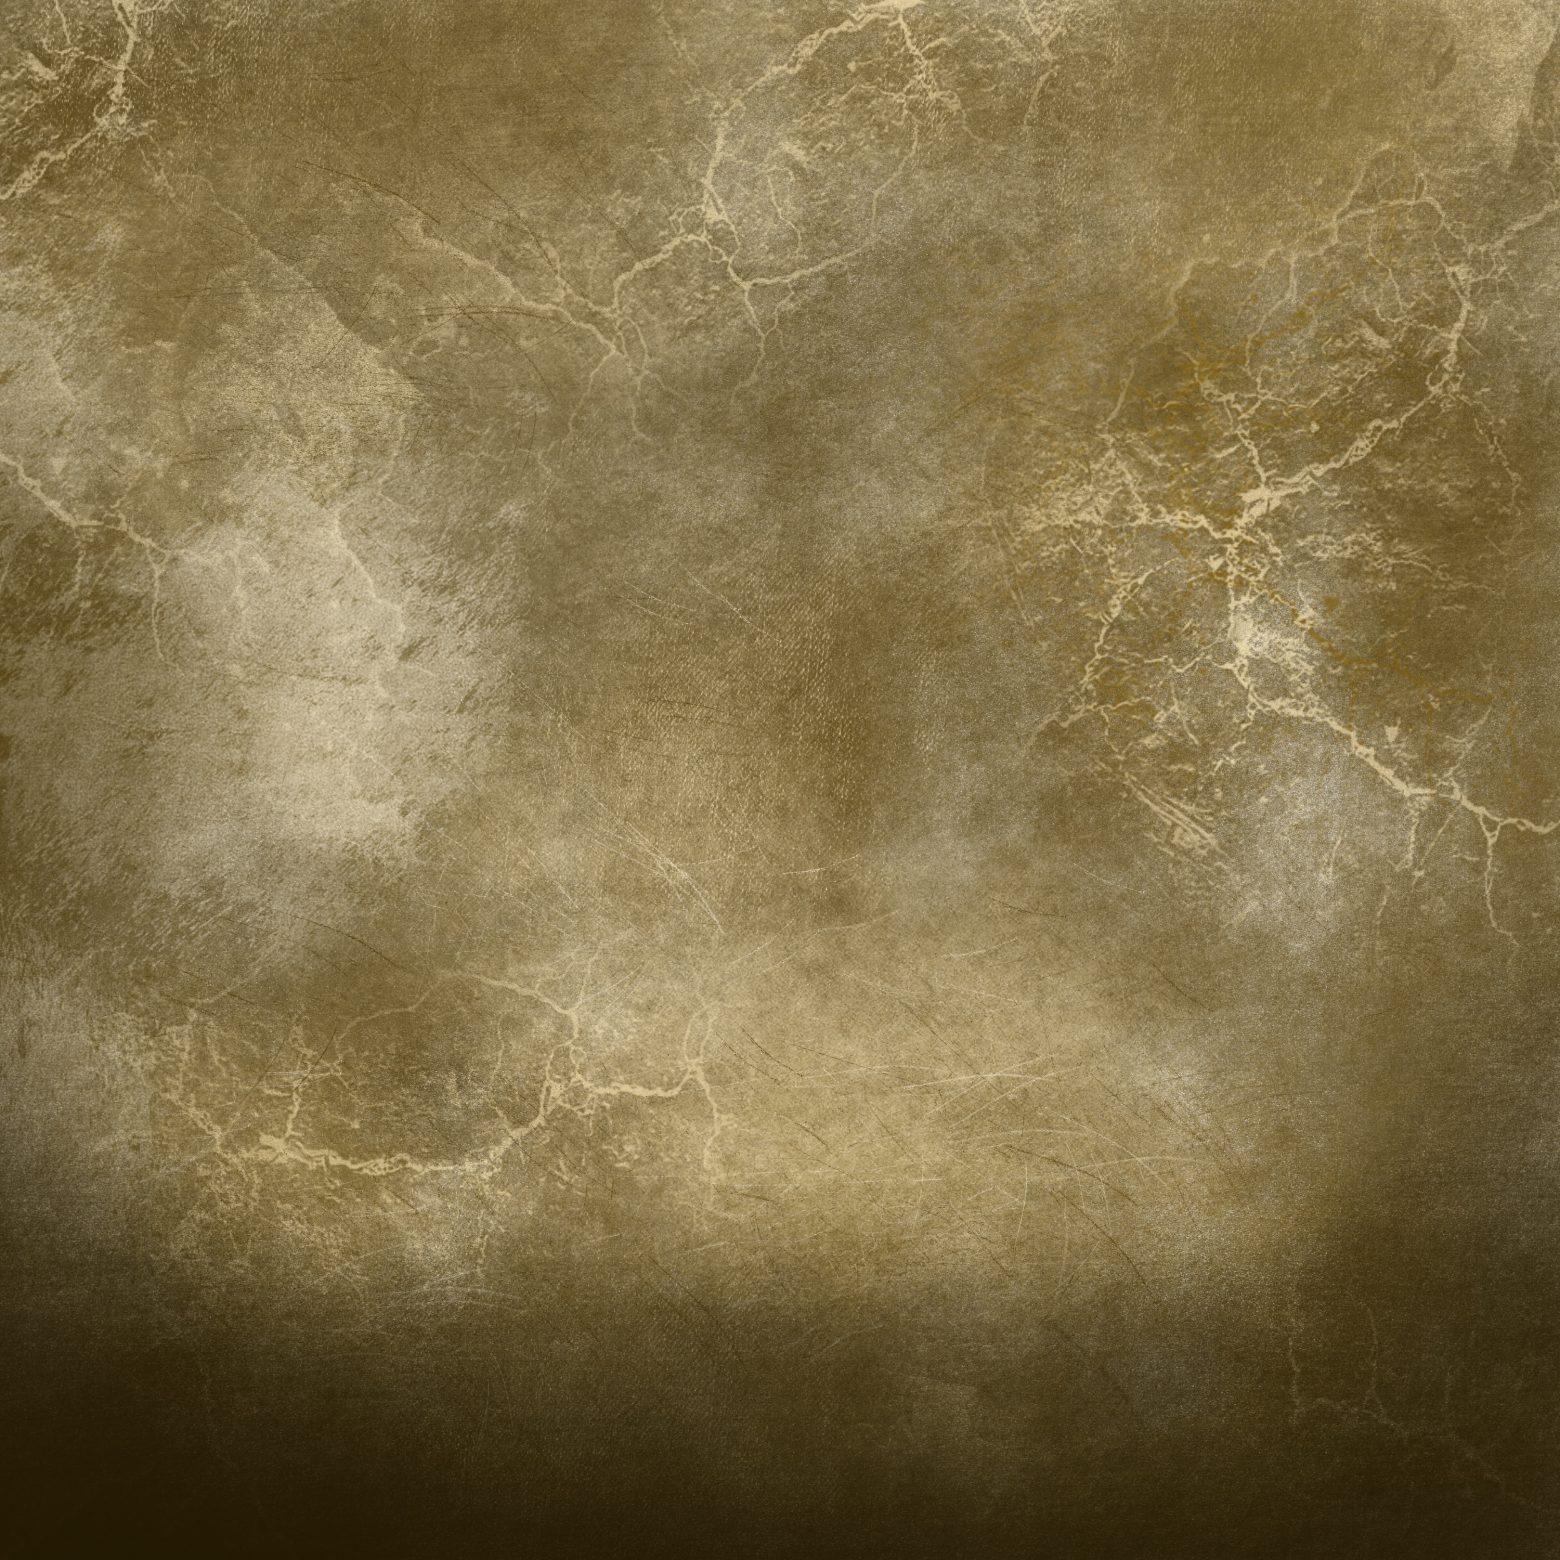 background-1688260